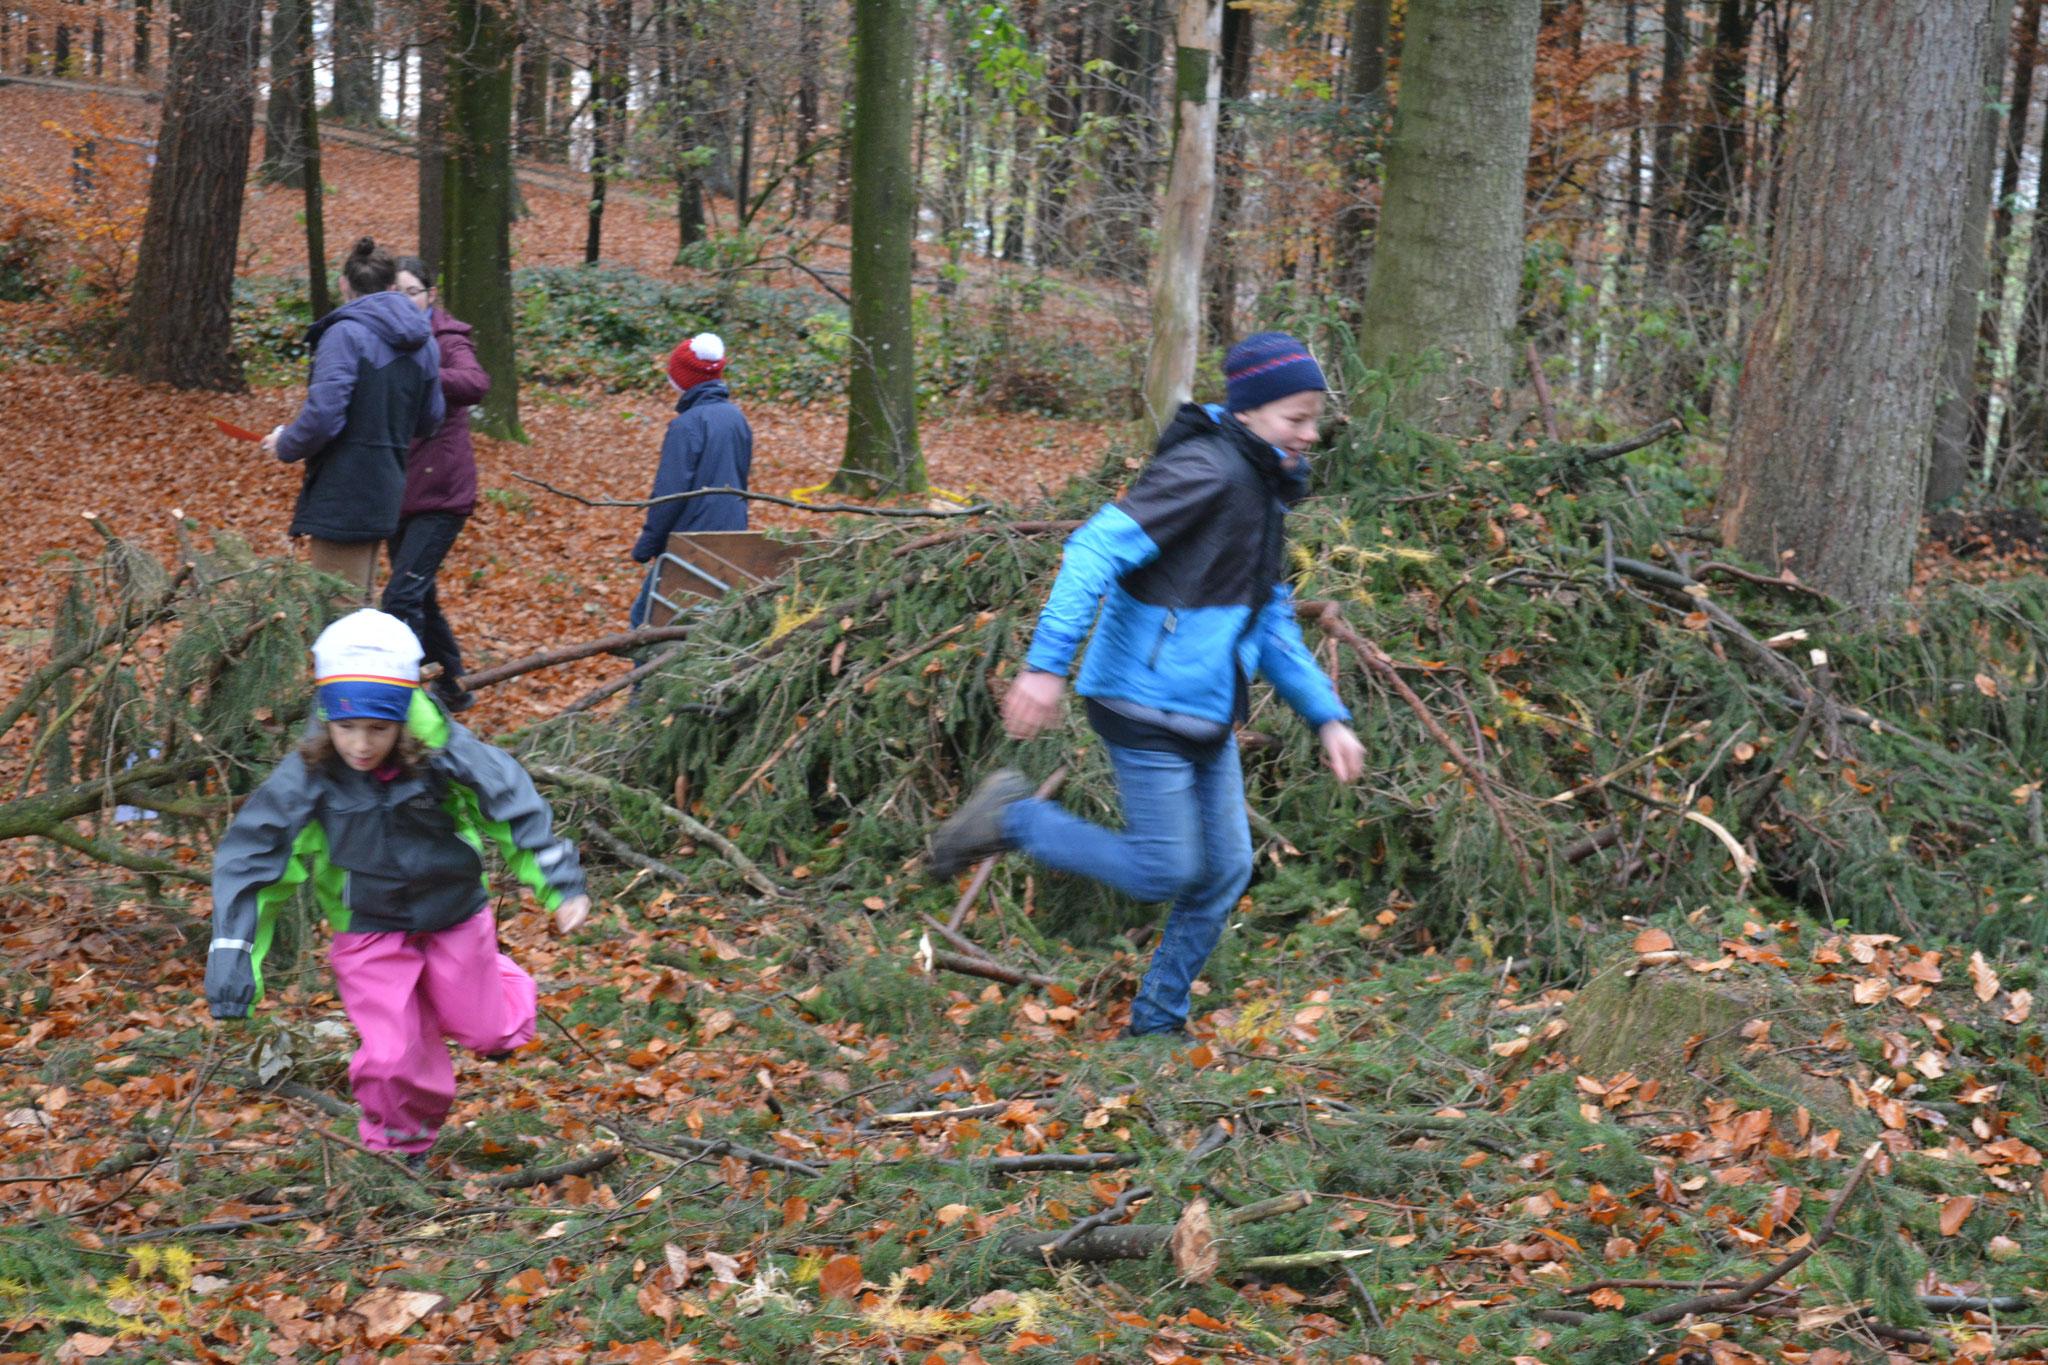 Action im Wald - auch das ist Jungschar! [November 2018]